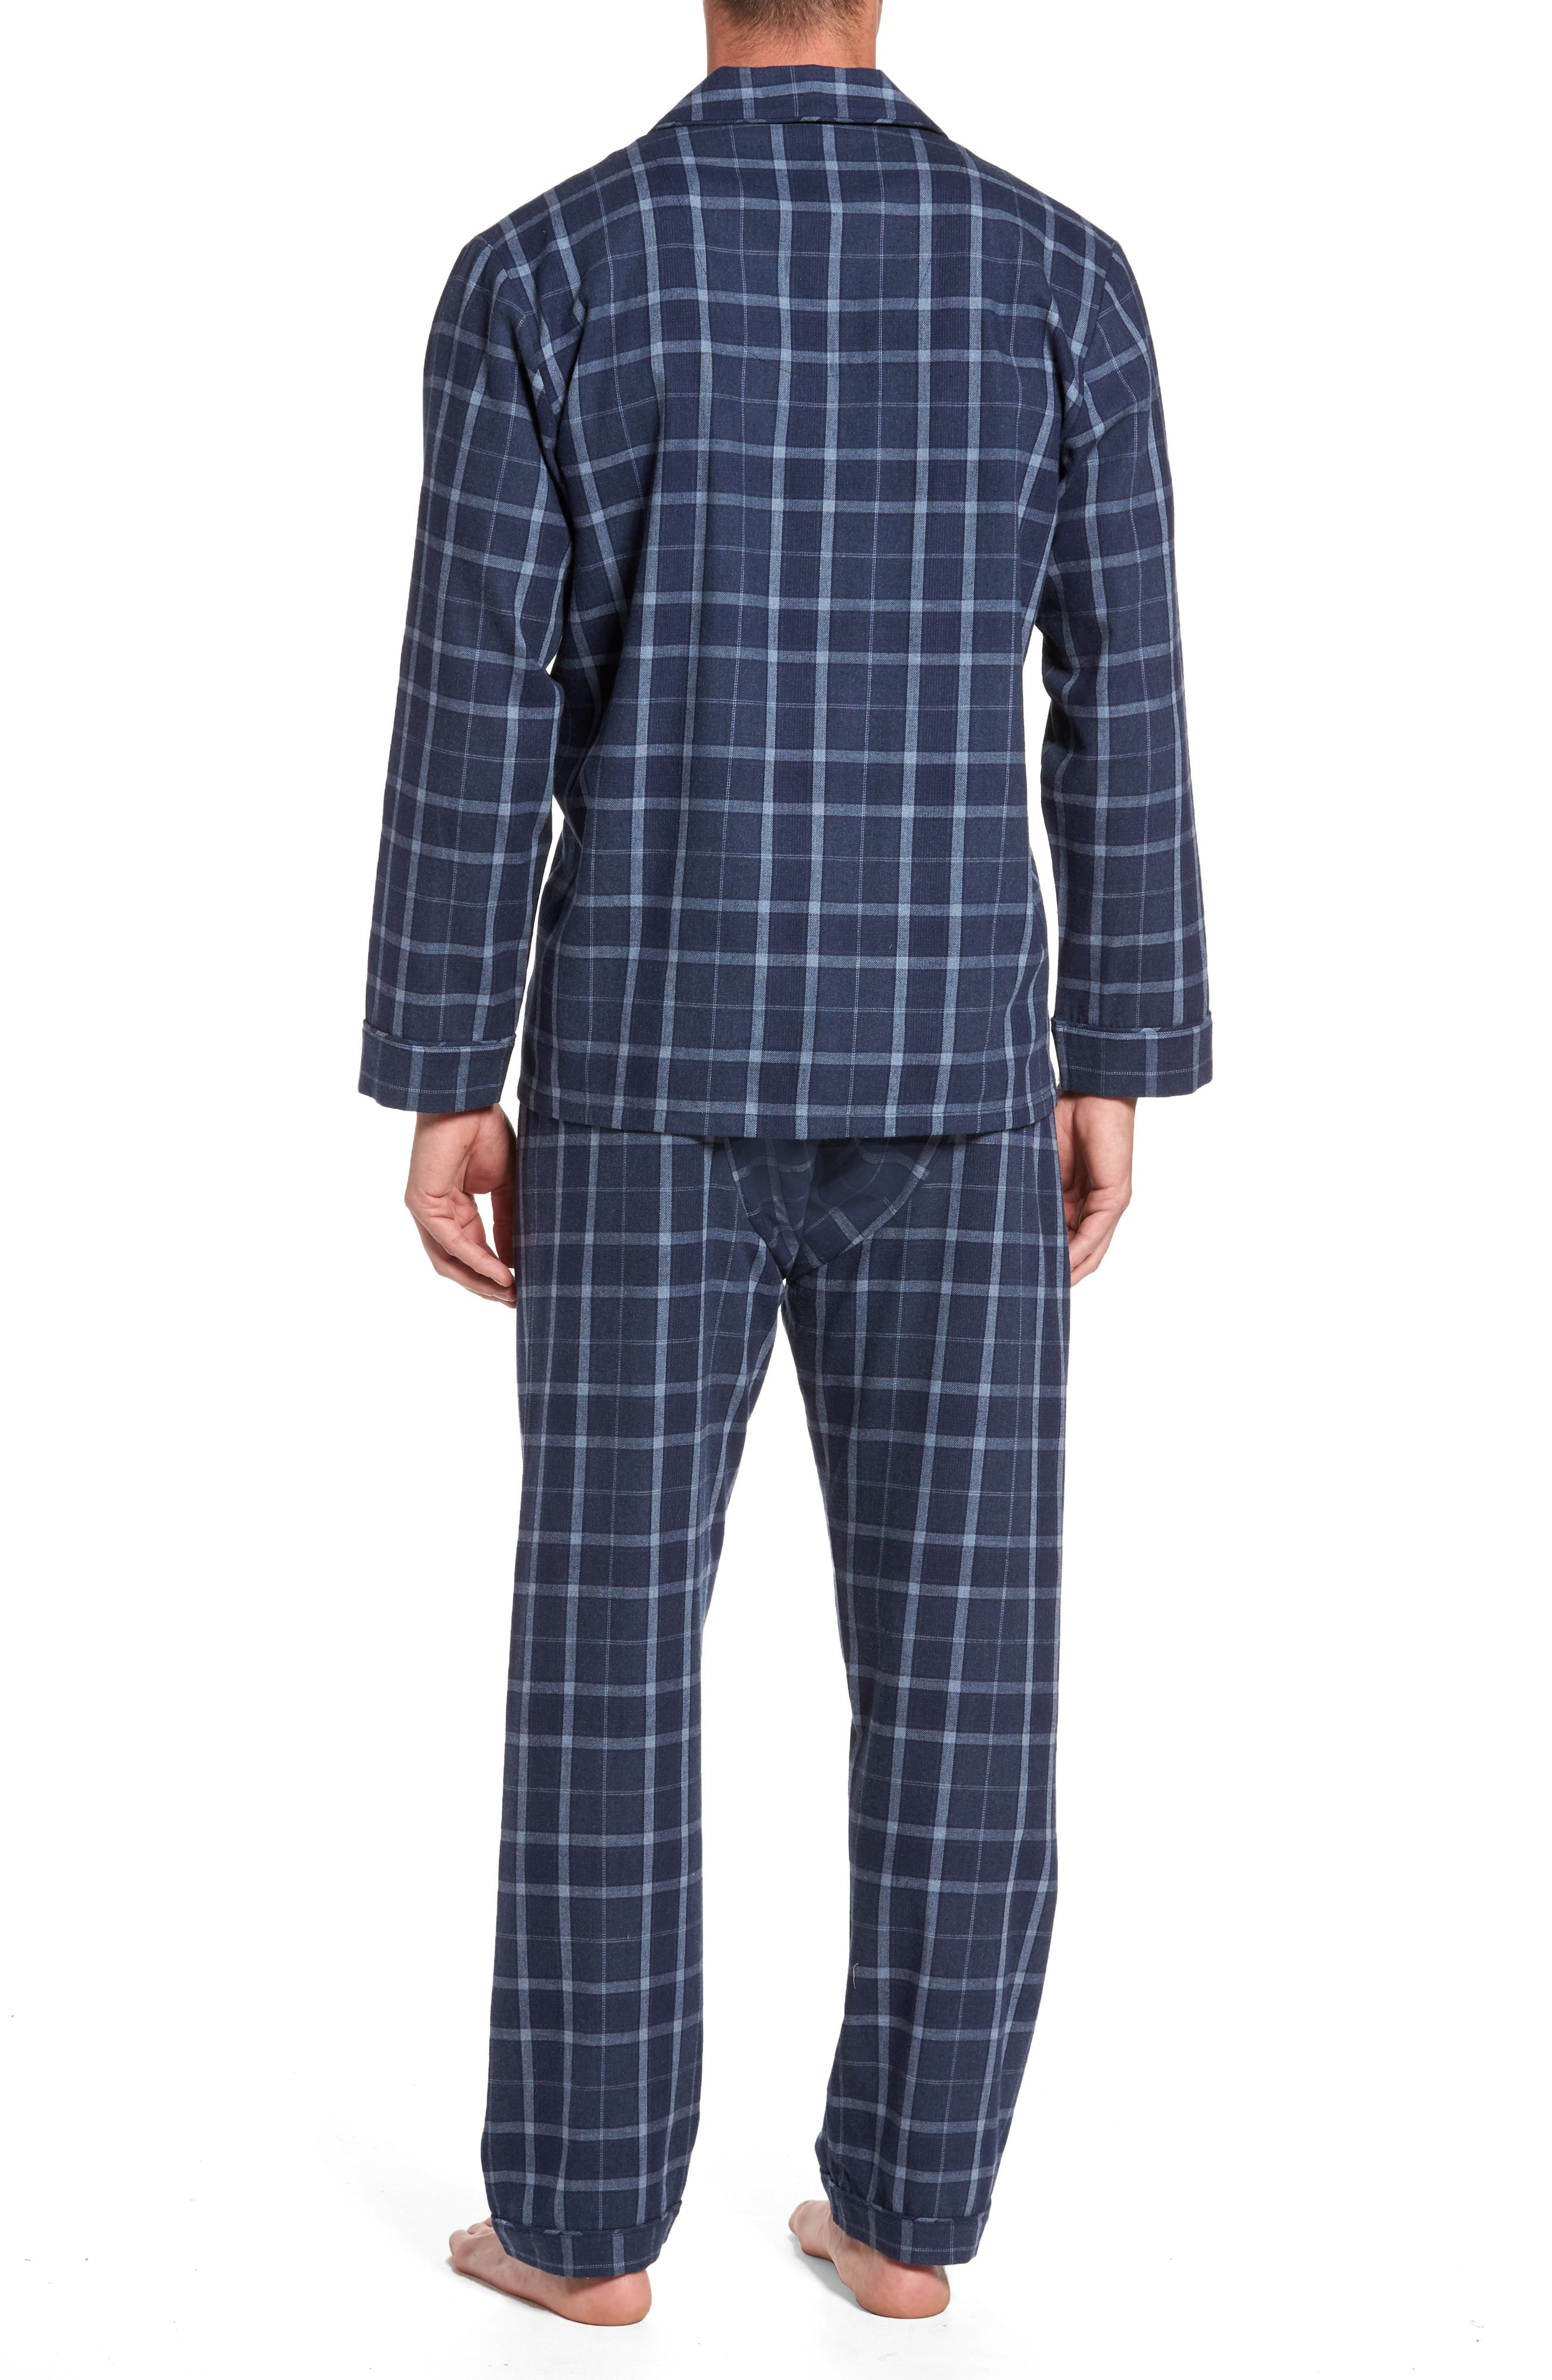 Guiness Plaid Pajama Set,                             Alternate thumbnail 2, color,                             Navy